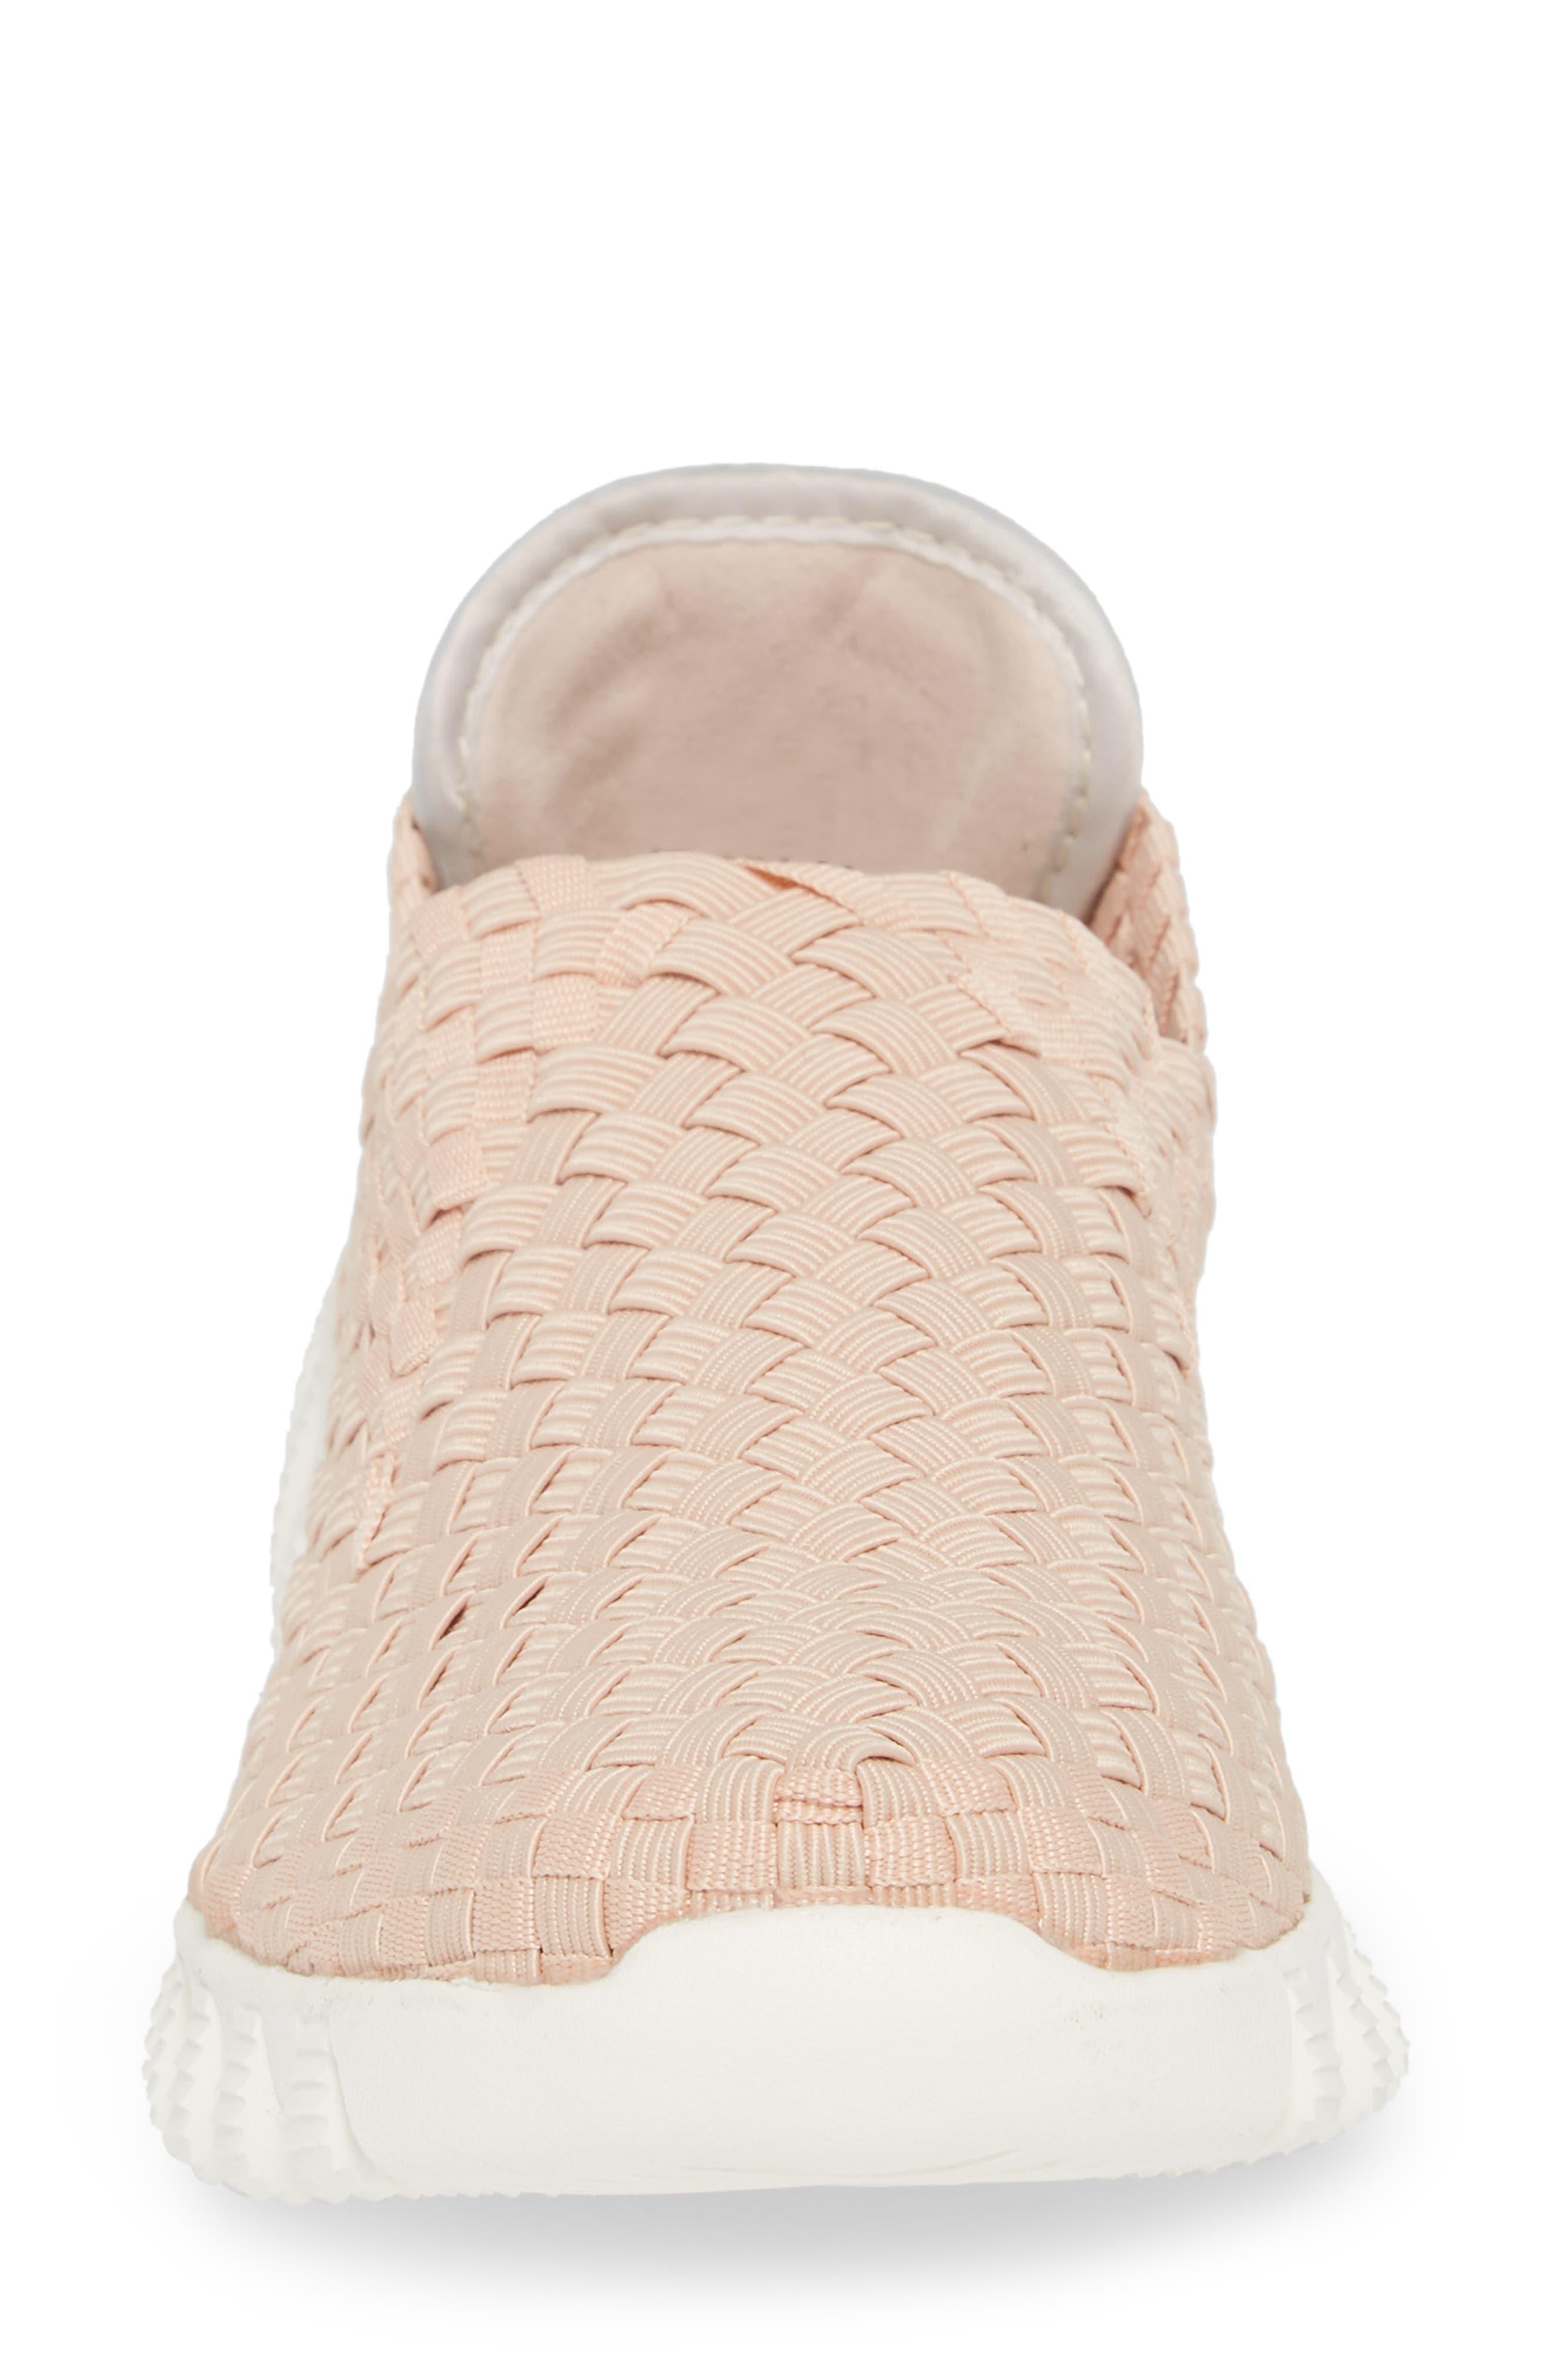 Woven Slip-On Sneaker,                             Alternate thumbnail 4, color,                             Blush Fabric